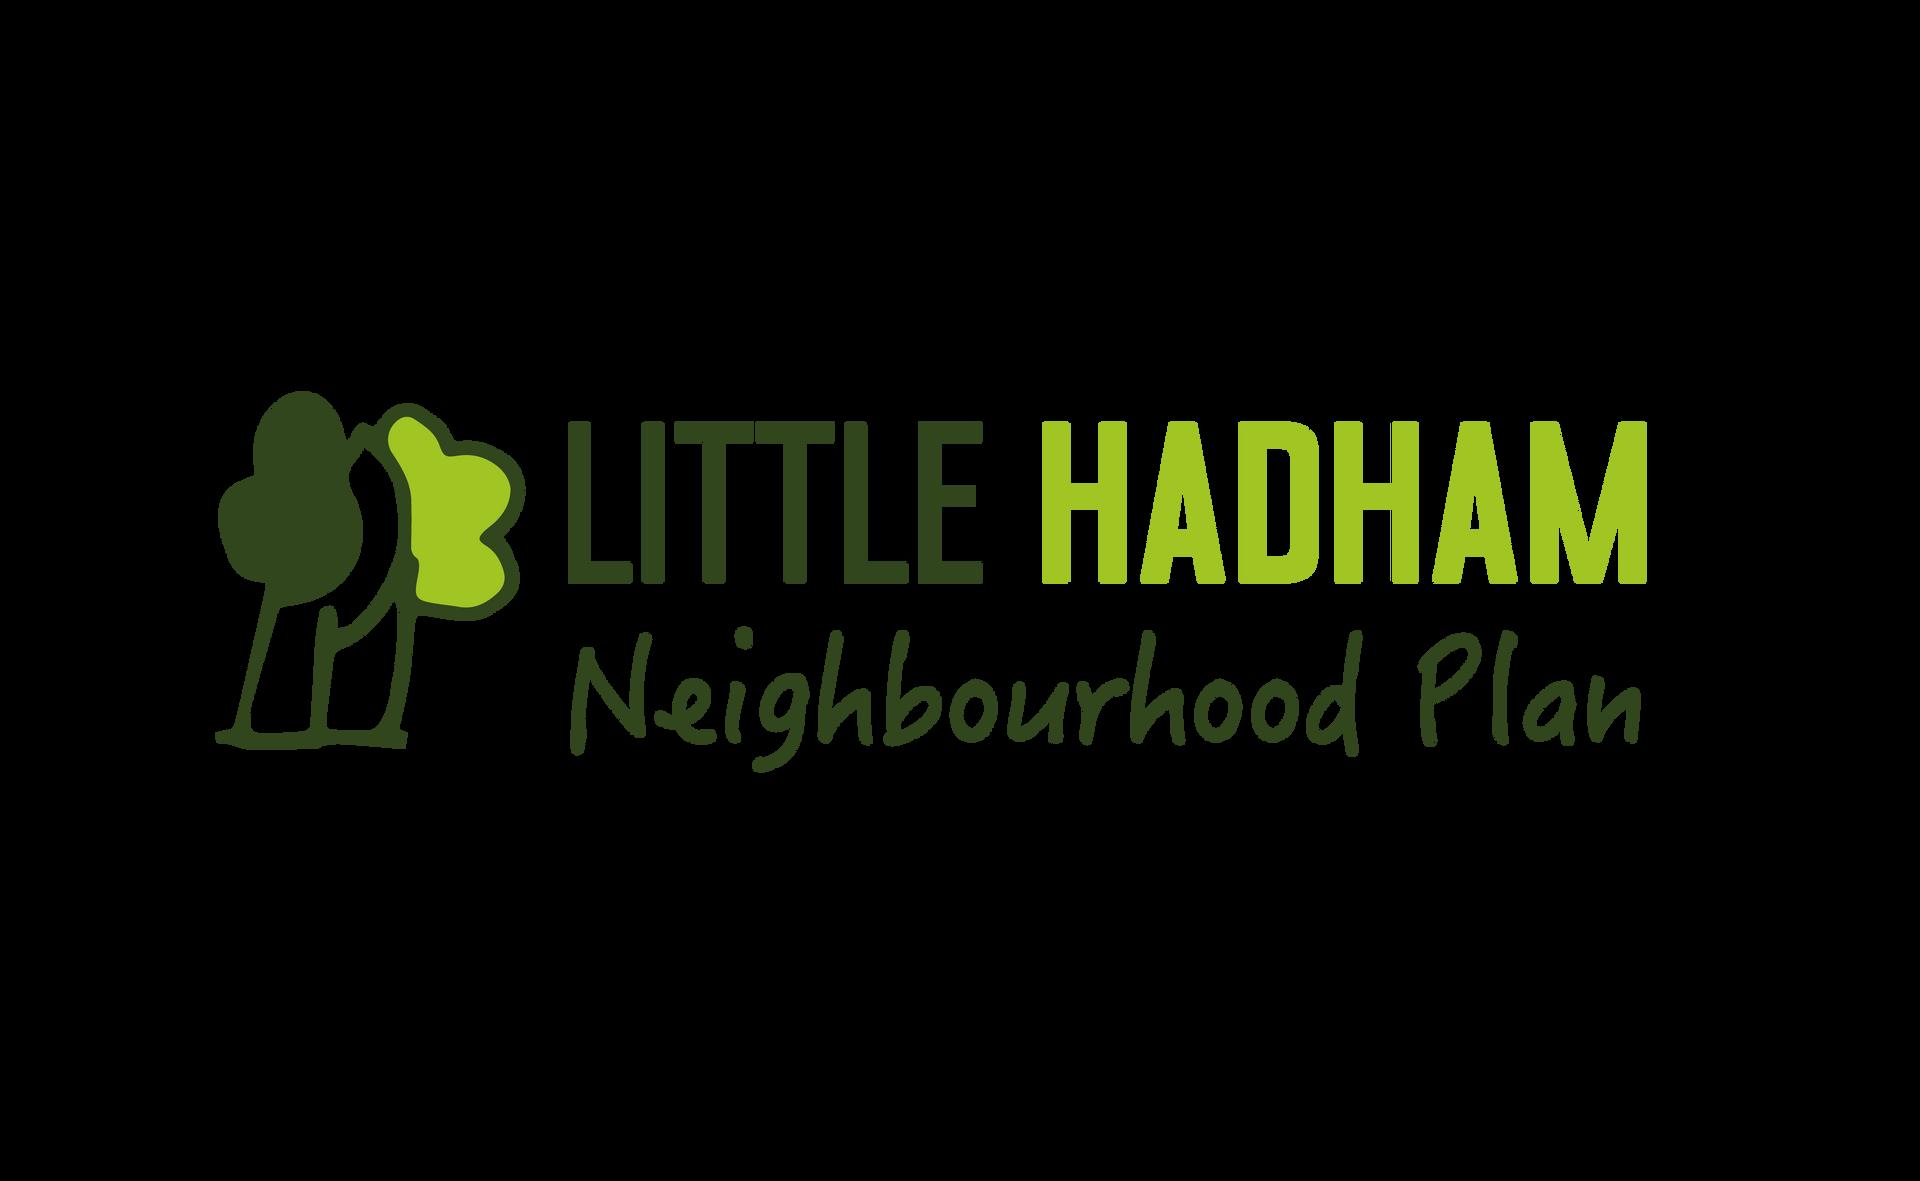 Little Hadham Neighbourhood Plan Identity